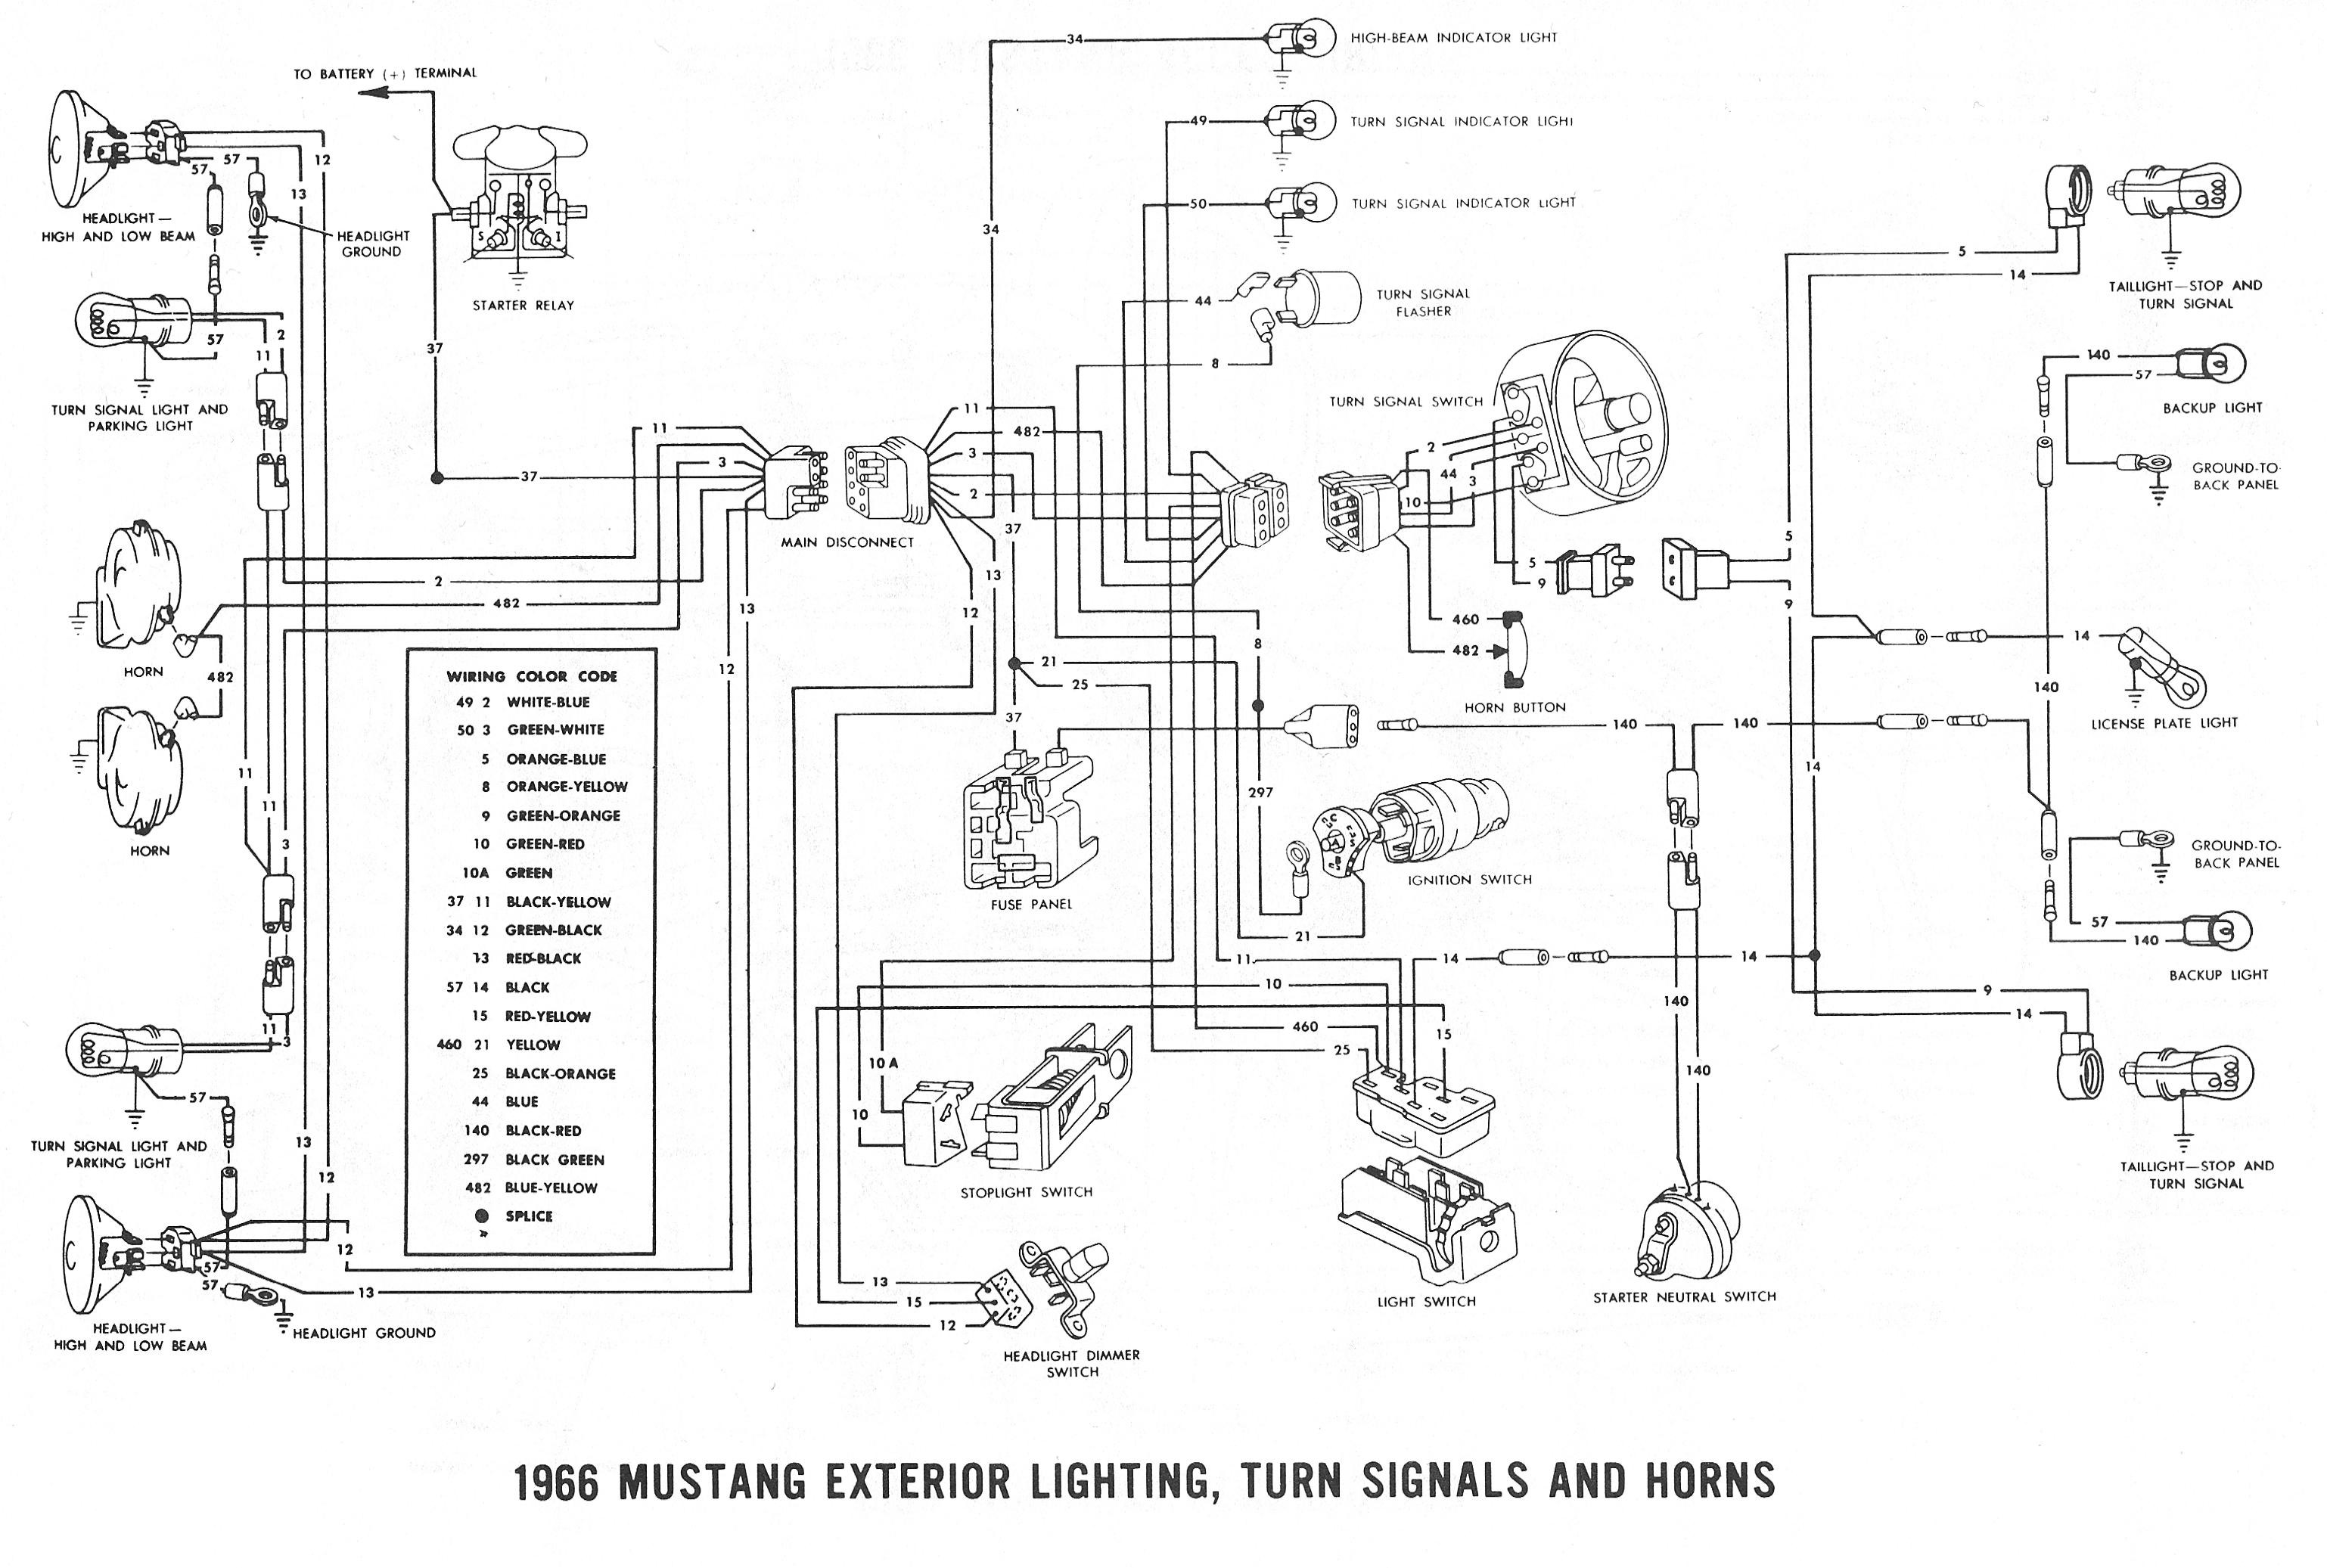 1966 Mustang Wiring Diagram ford F100 Heater Wiring Diagram Get Free Image About Wiring Diagram Of 1966 Mustang Wiring Diagram